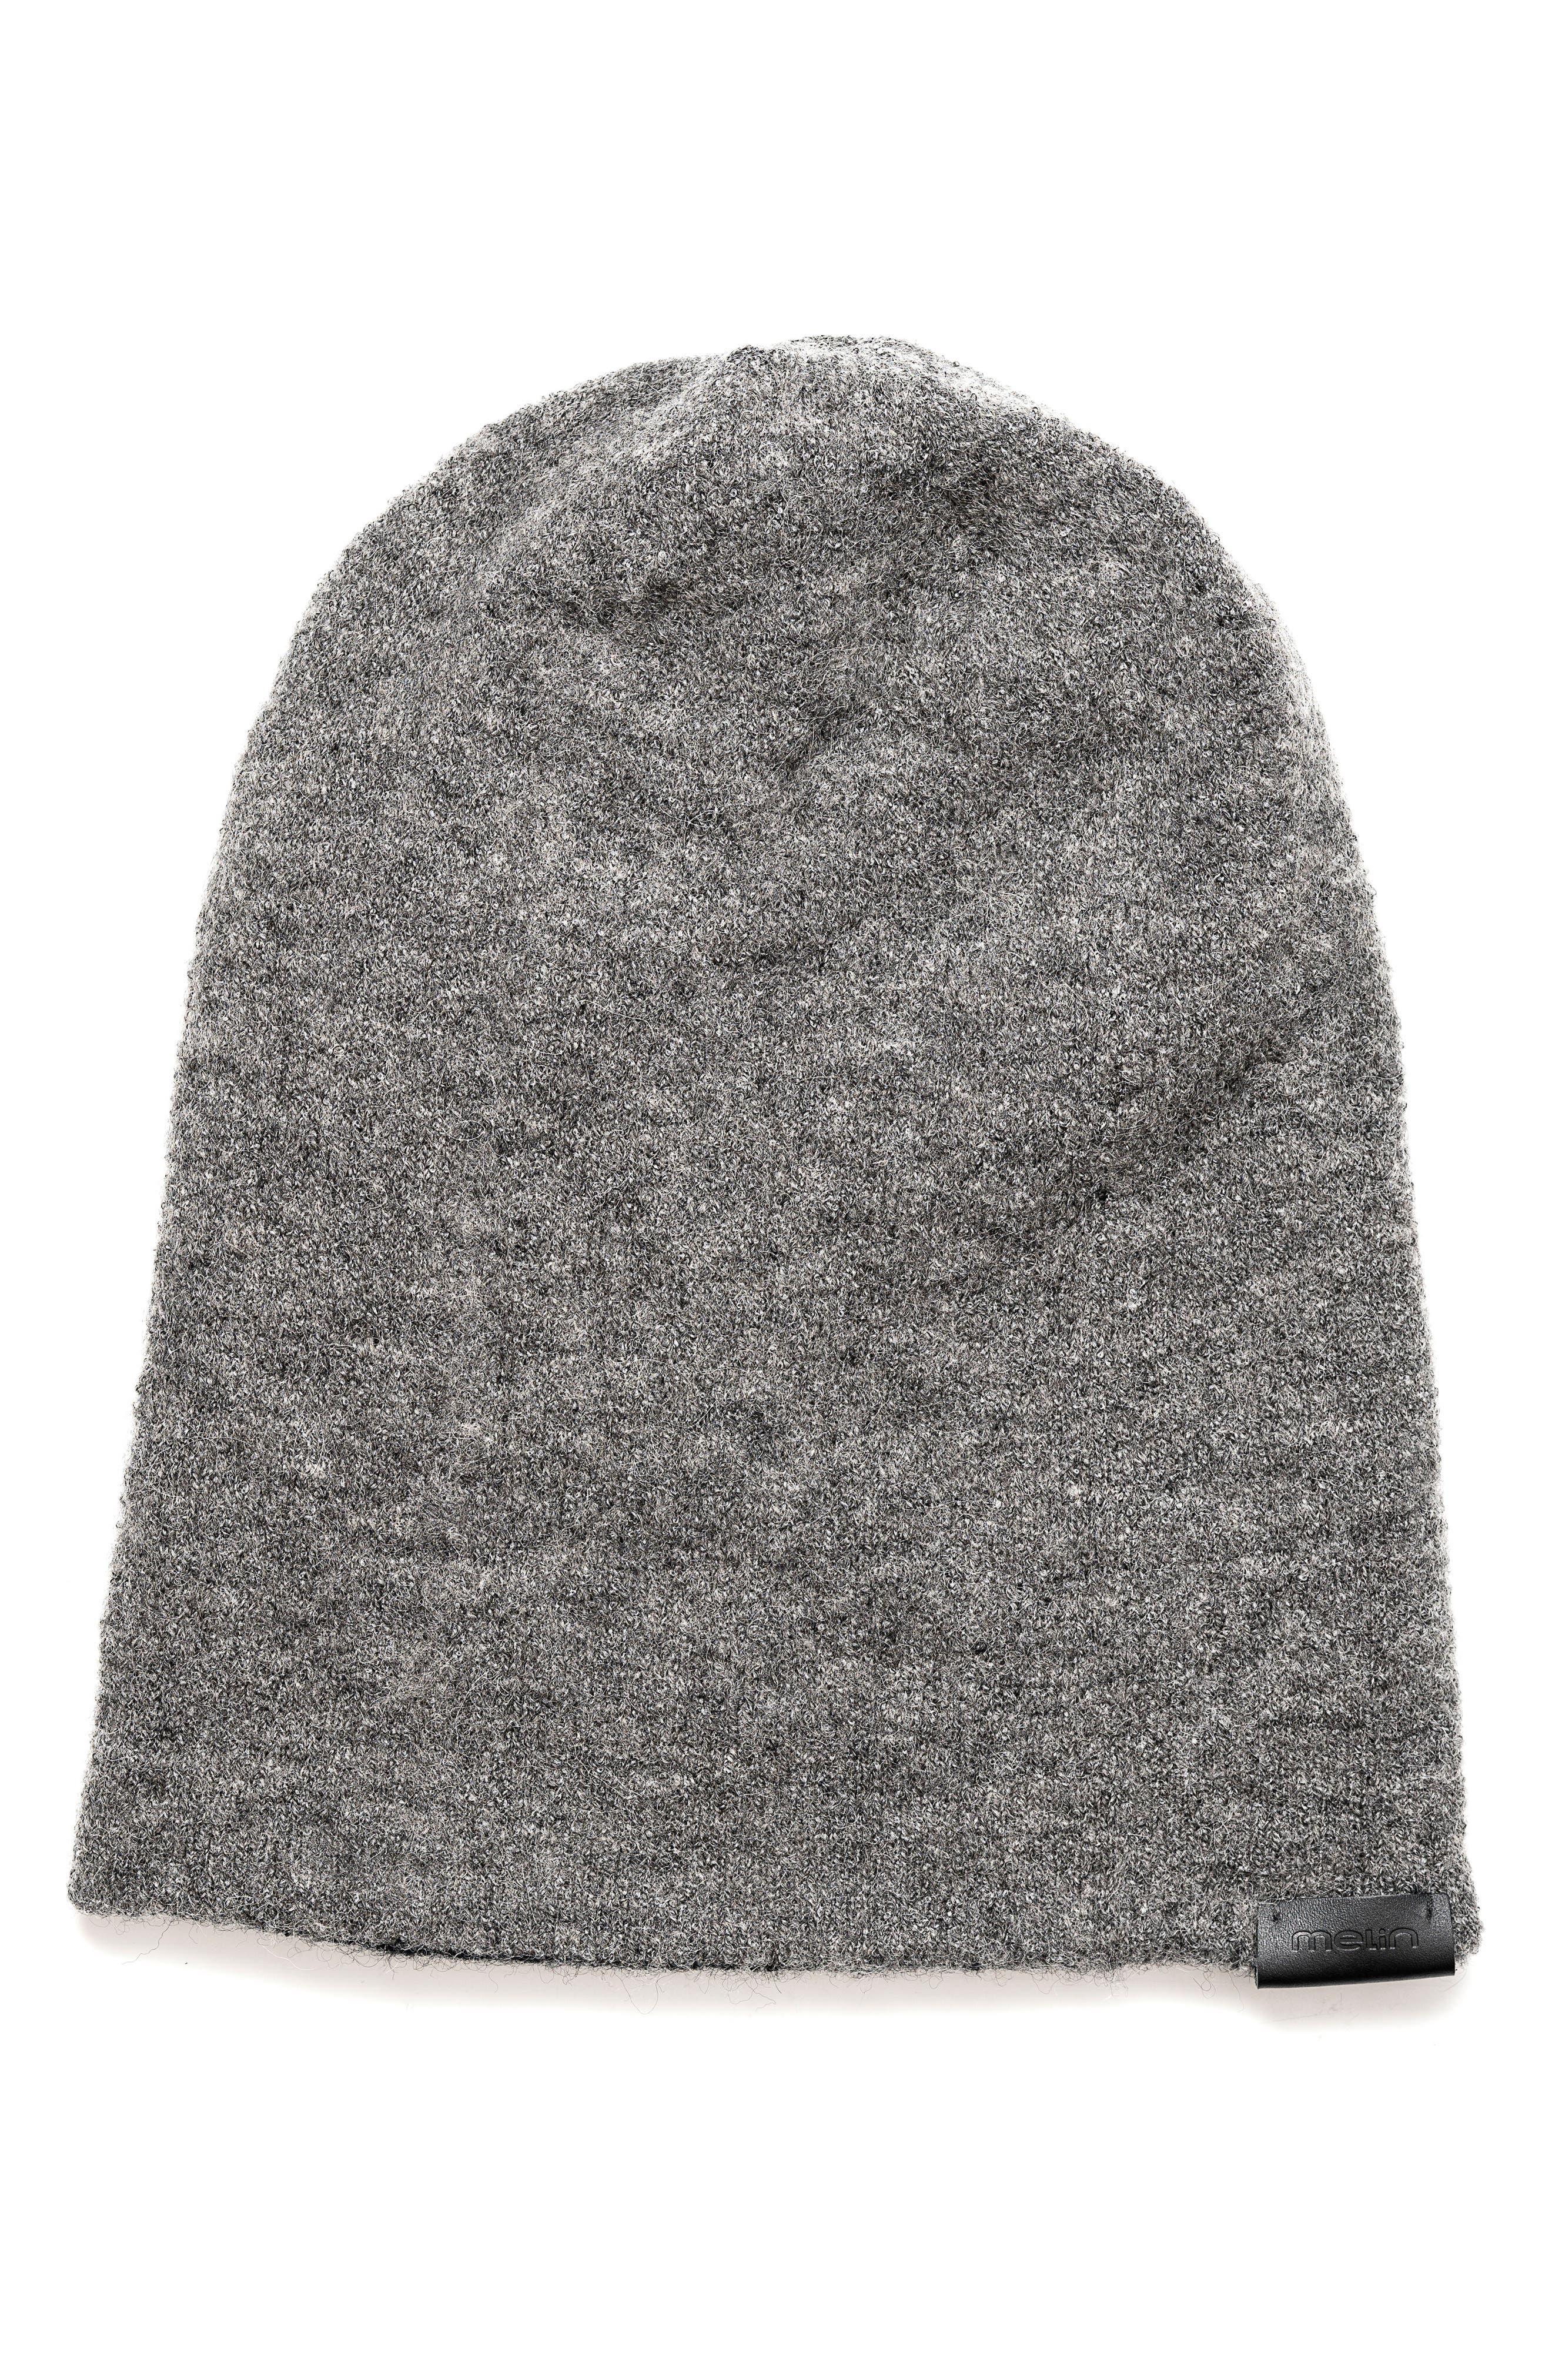 Double Happiness Reversible Knit Cap,                             Alternate thumbnail 2, color,                             270